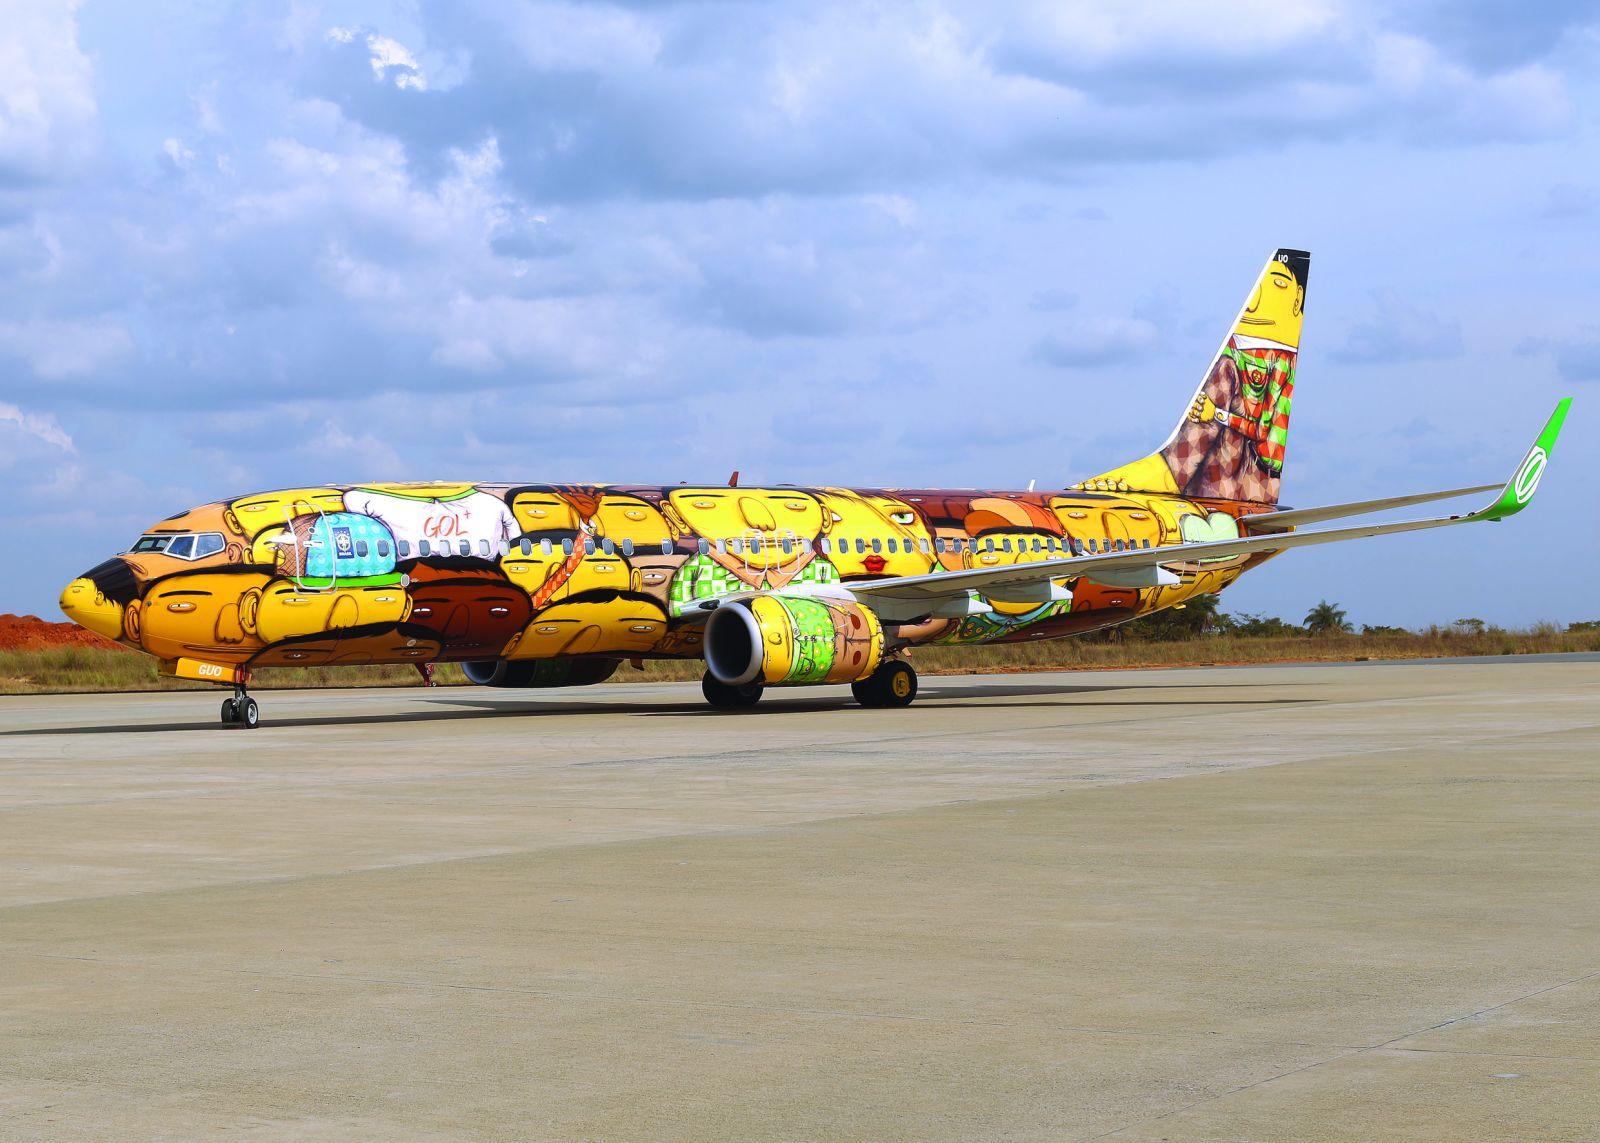 os gemeos graffiti aviao brasil selecao brasileira copa do mundo 2014 (1)